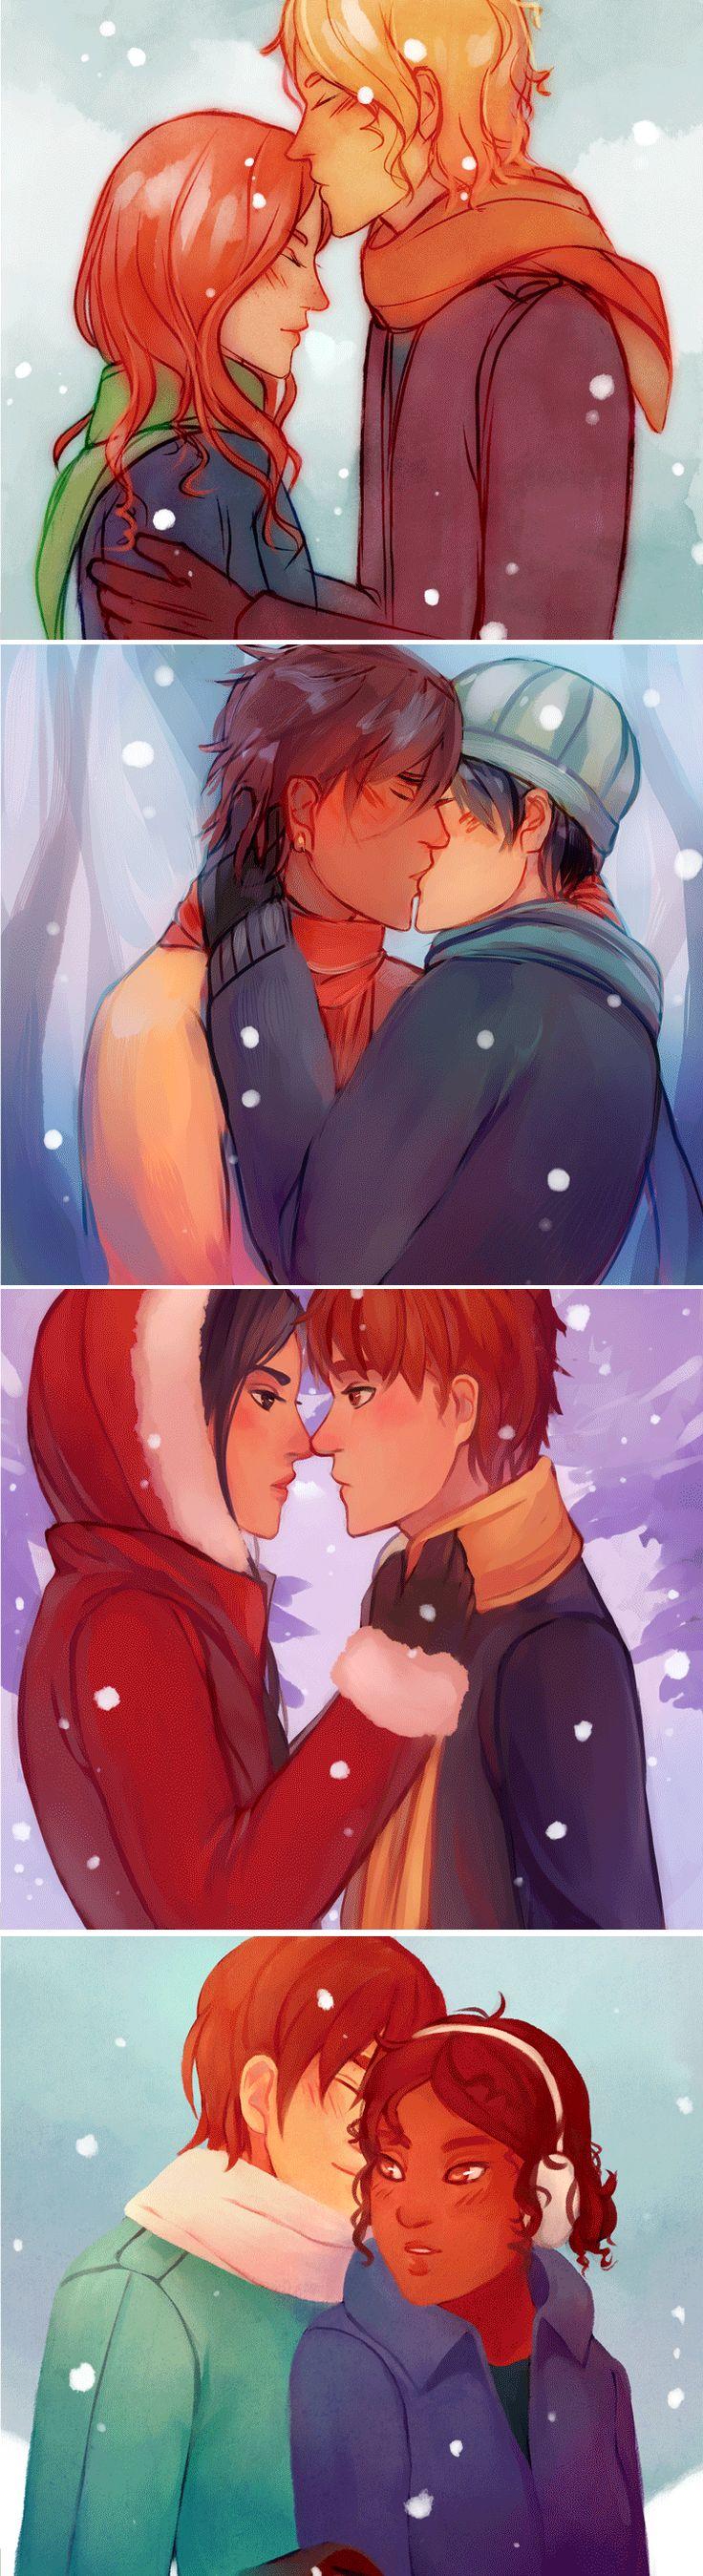 TMI couples in the snow